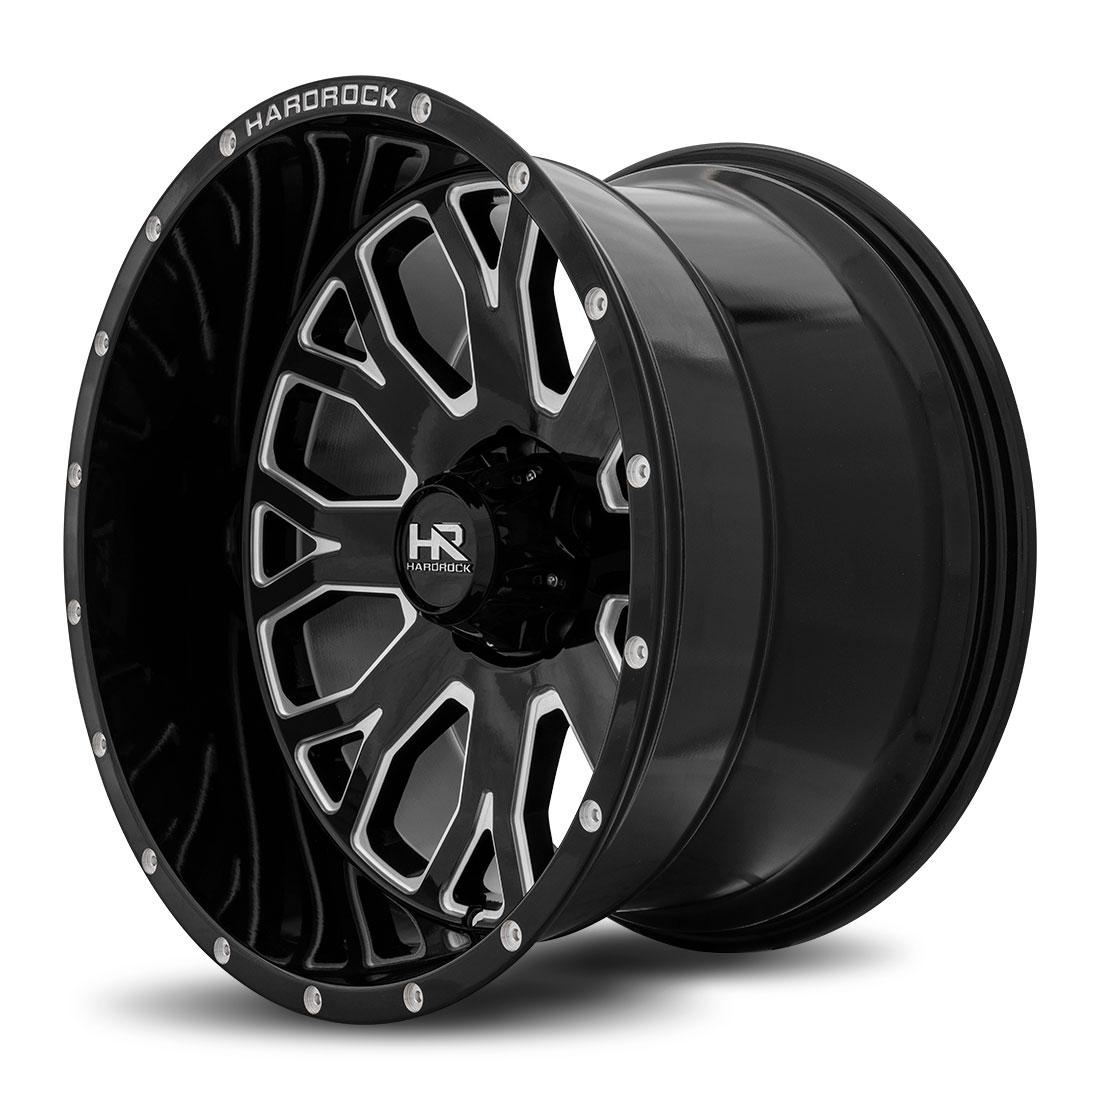 Hardrock Offroad Wheels H504 Slammer-Xposed - Gloss Black Milled - 20x12